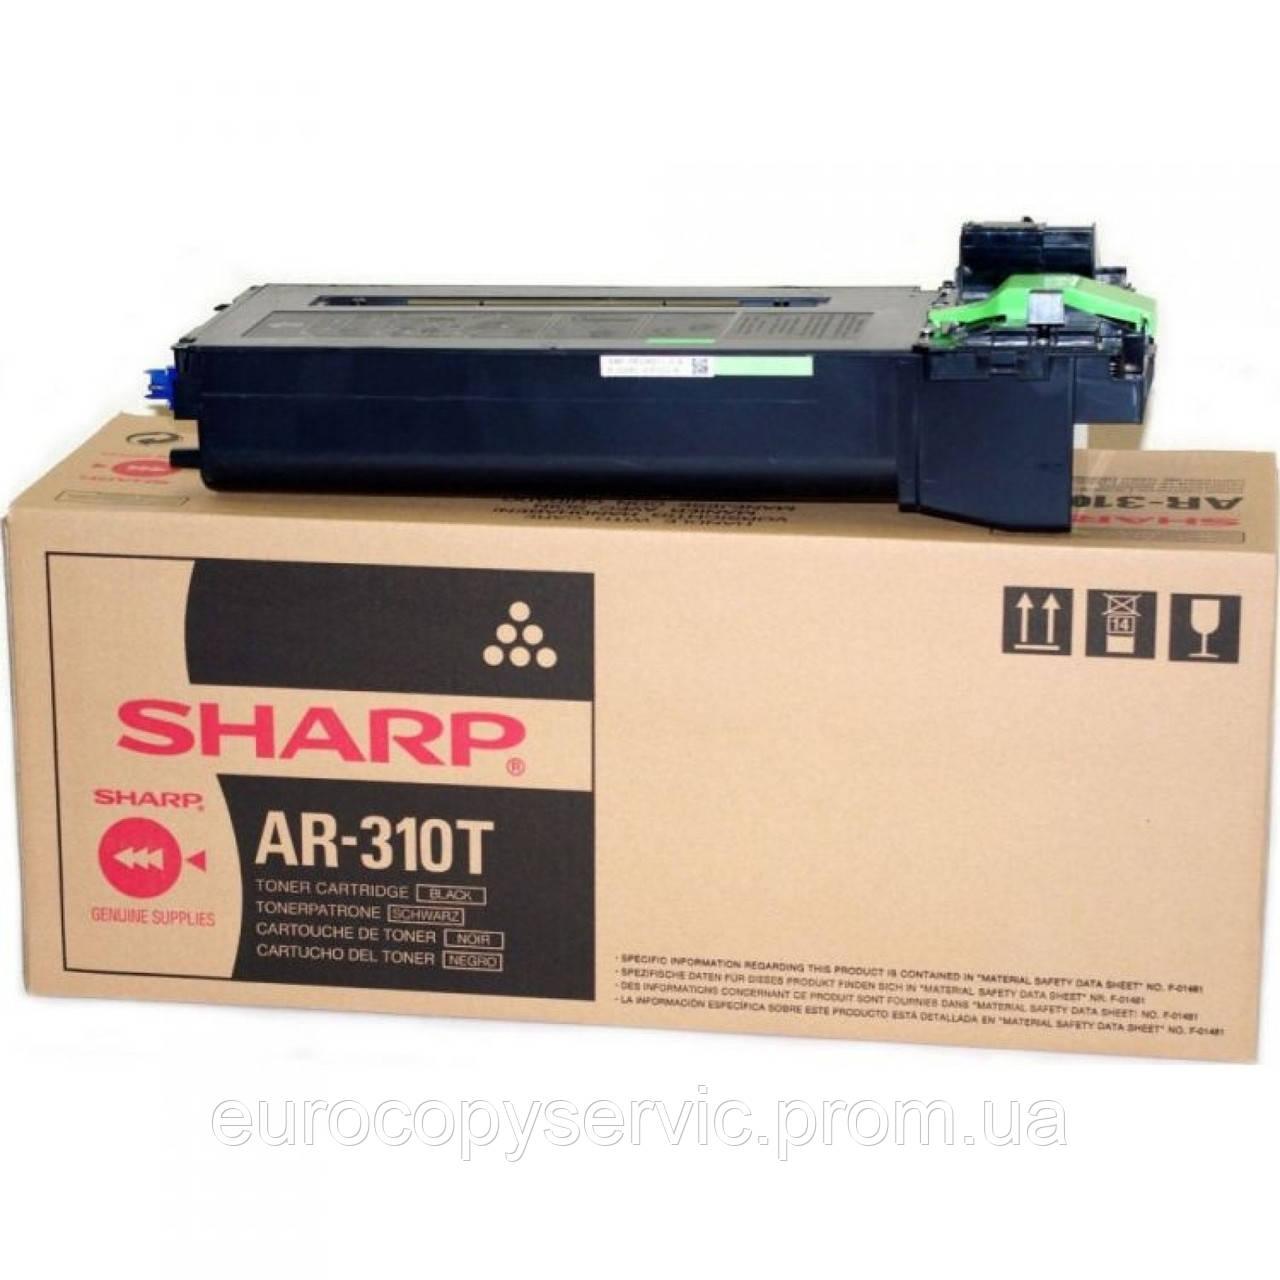 Картридж Sharp AR310T Black (AR310LT) Original